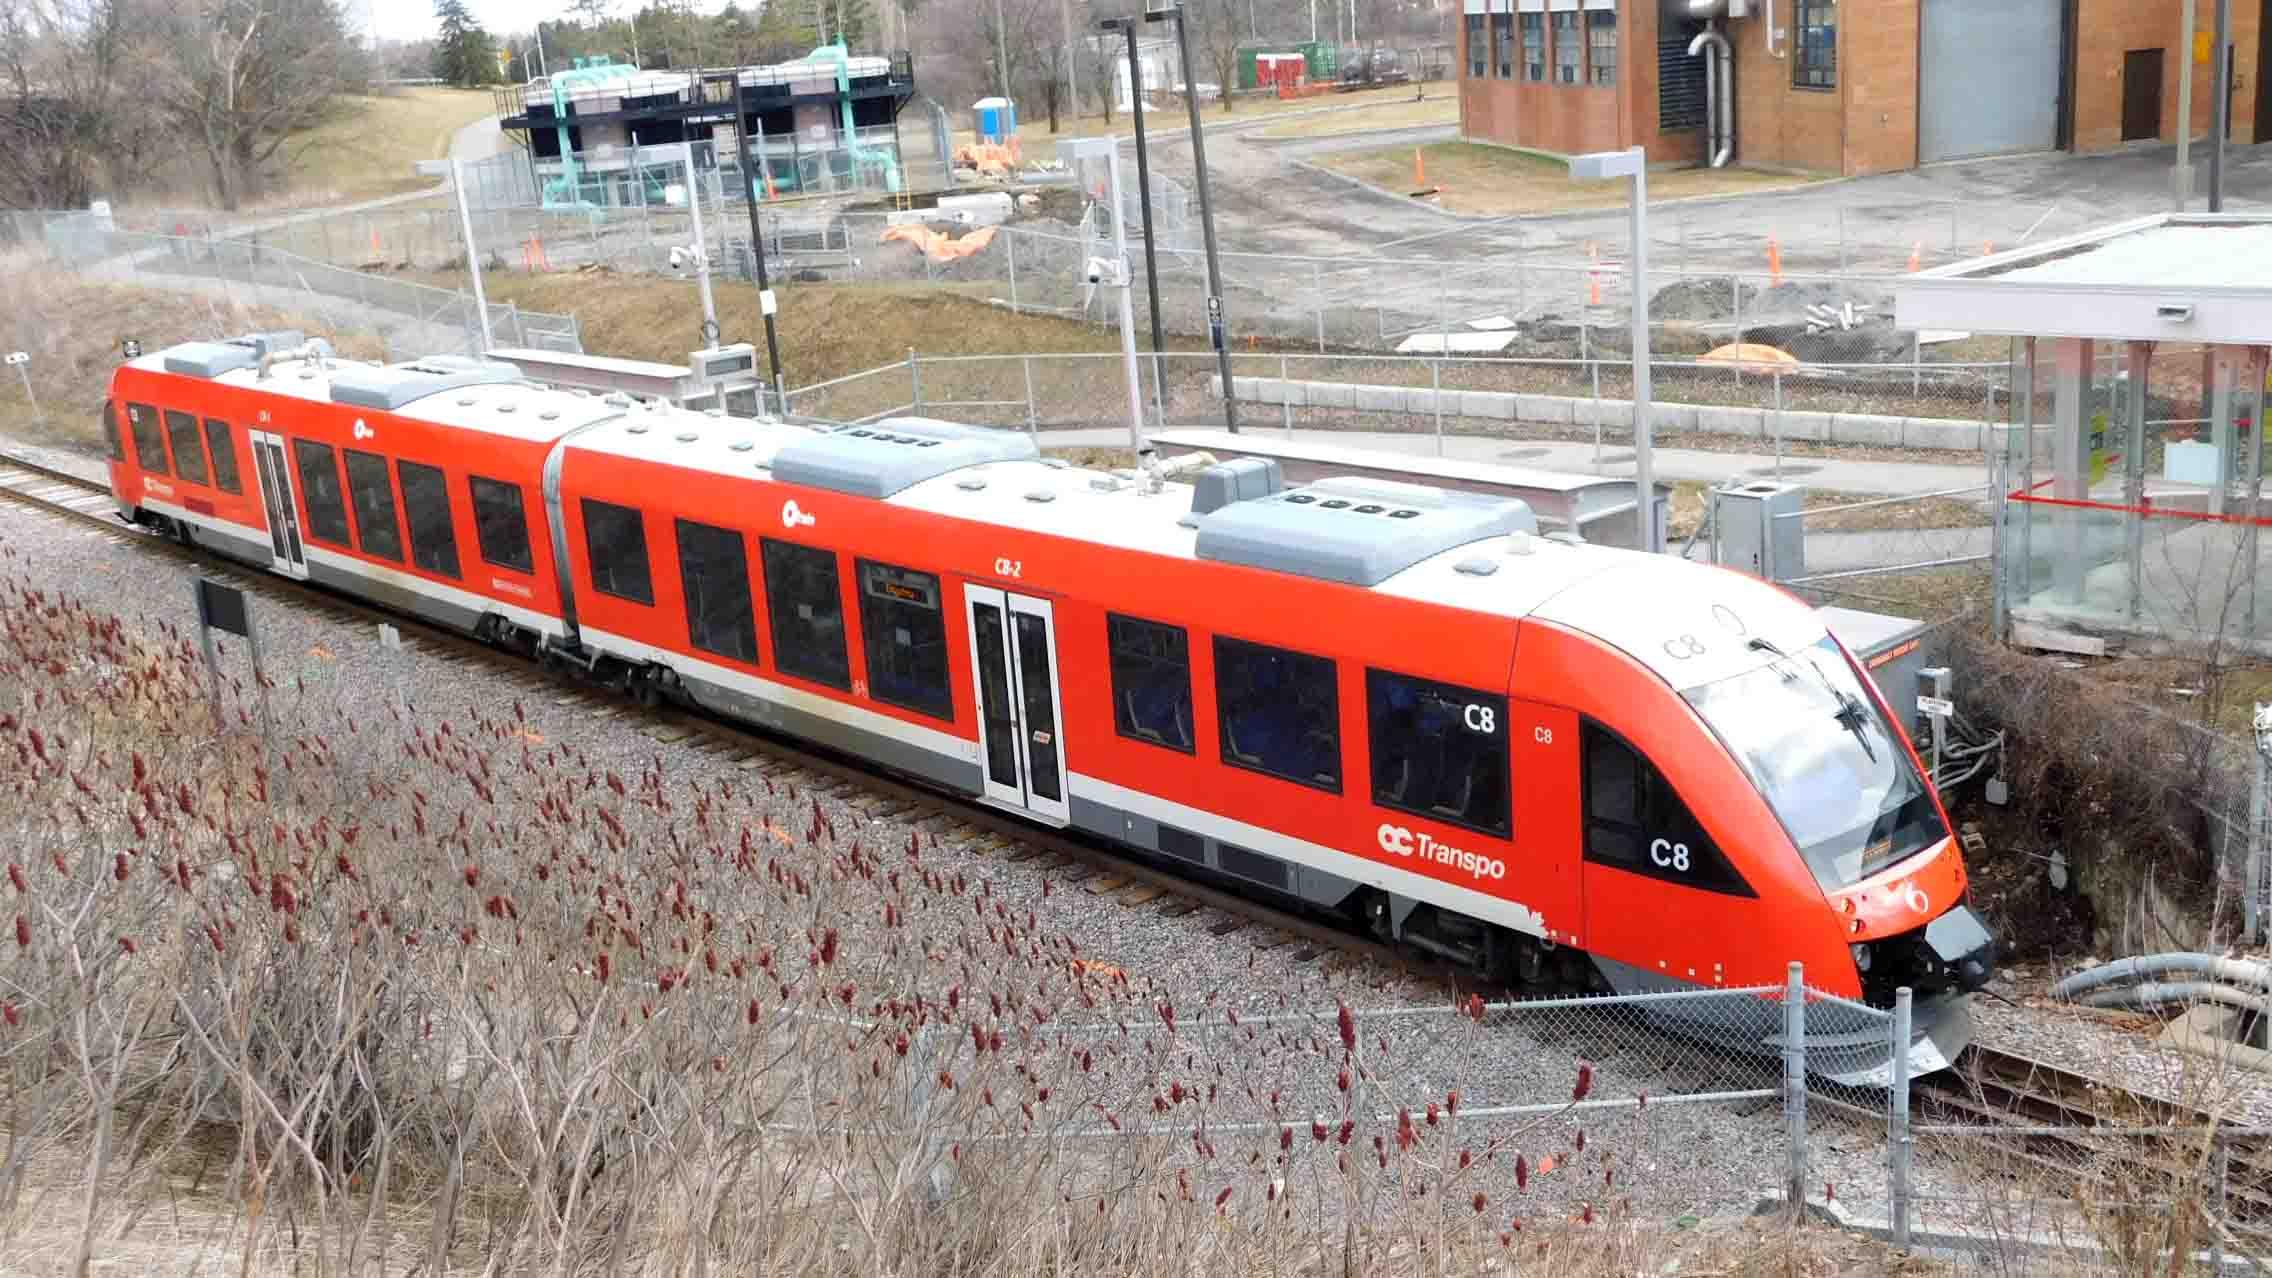 Alstom_Coradia_LINT_41_on_the_Trillium_Line_0891